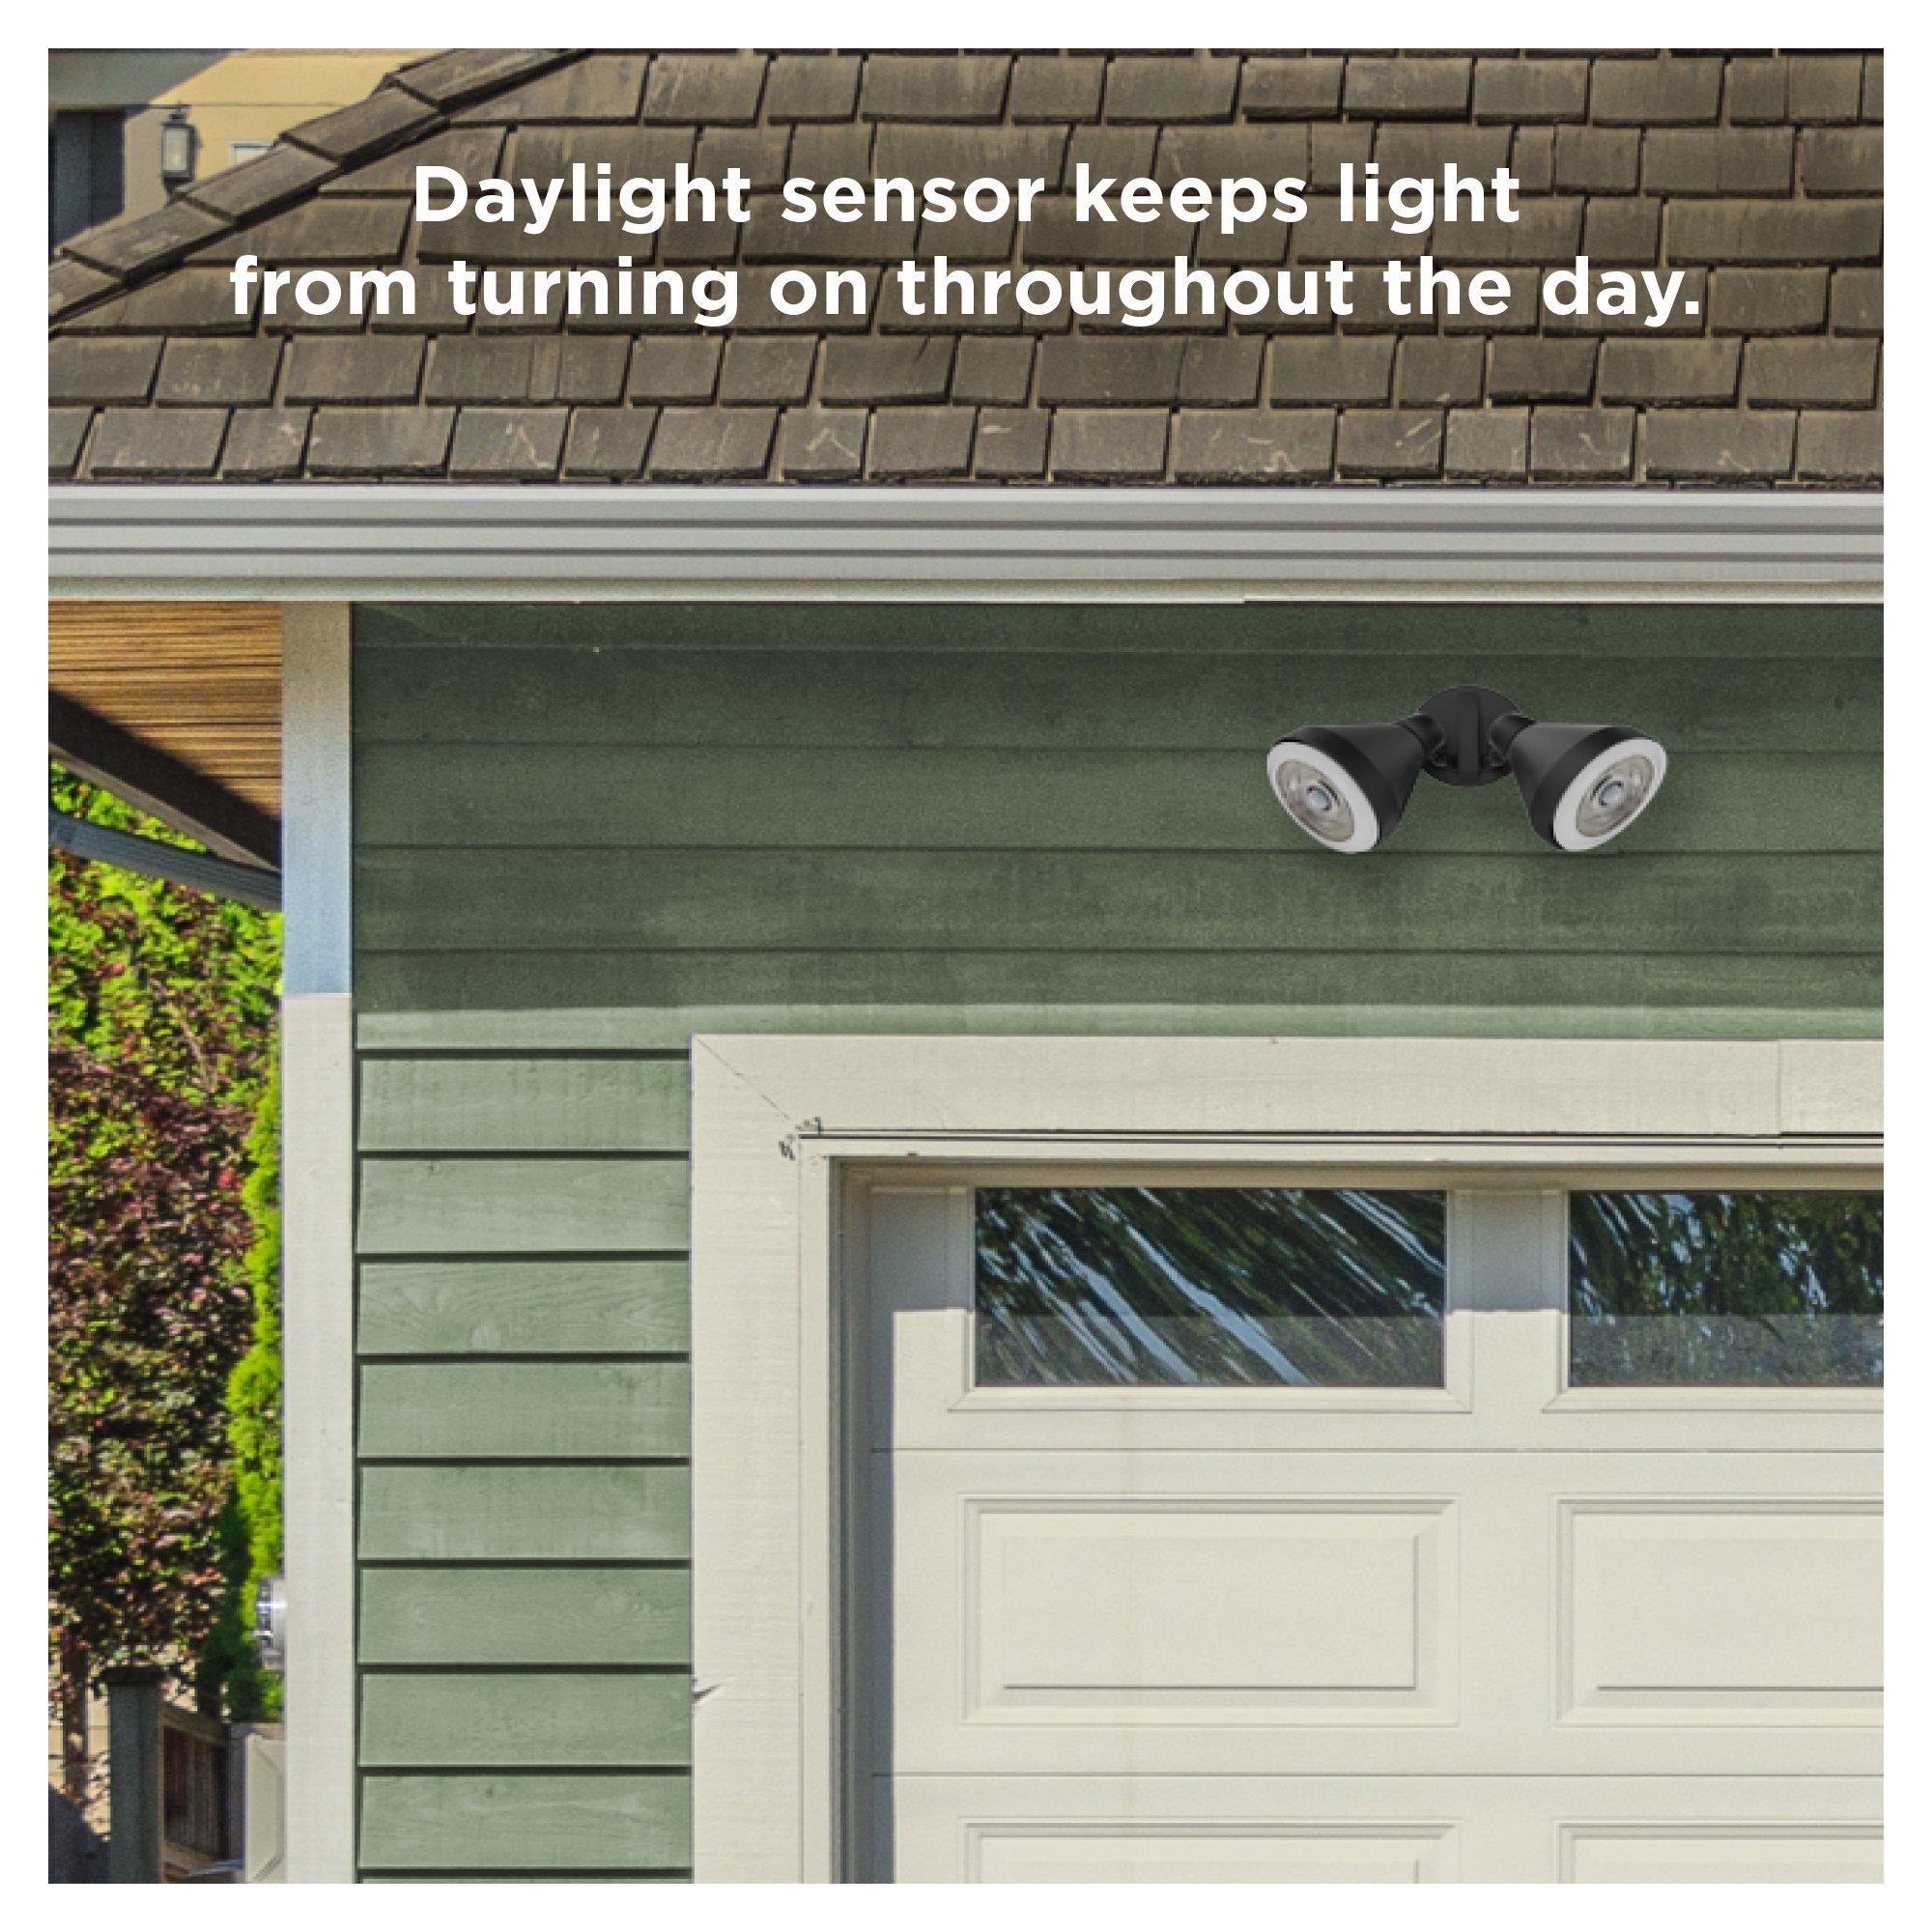 Sengled LED Flood Light with Motion Sensor & Daylight Sensor, Smart LED Light Bulb PAR38, Dusk to Dawn Bulb, Waterproof 3000K for Outdoor Use, 2 Pack by Sengled (Image #6)